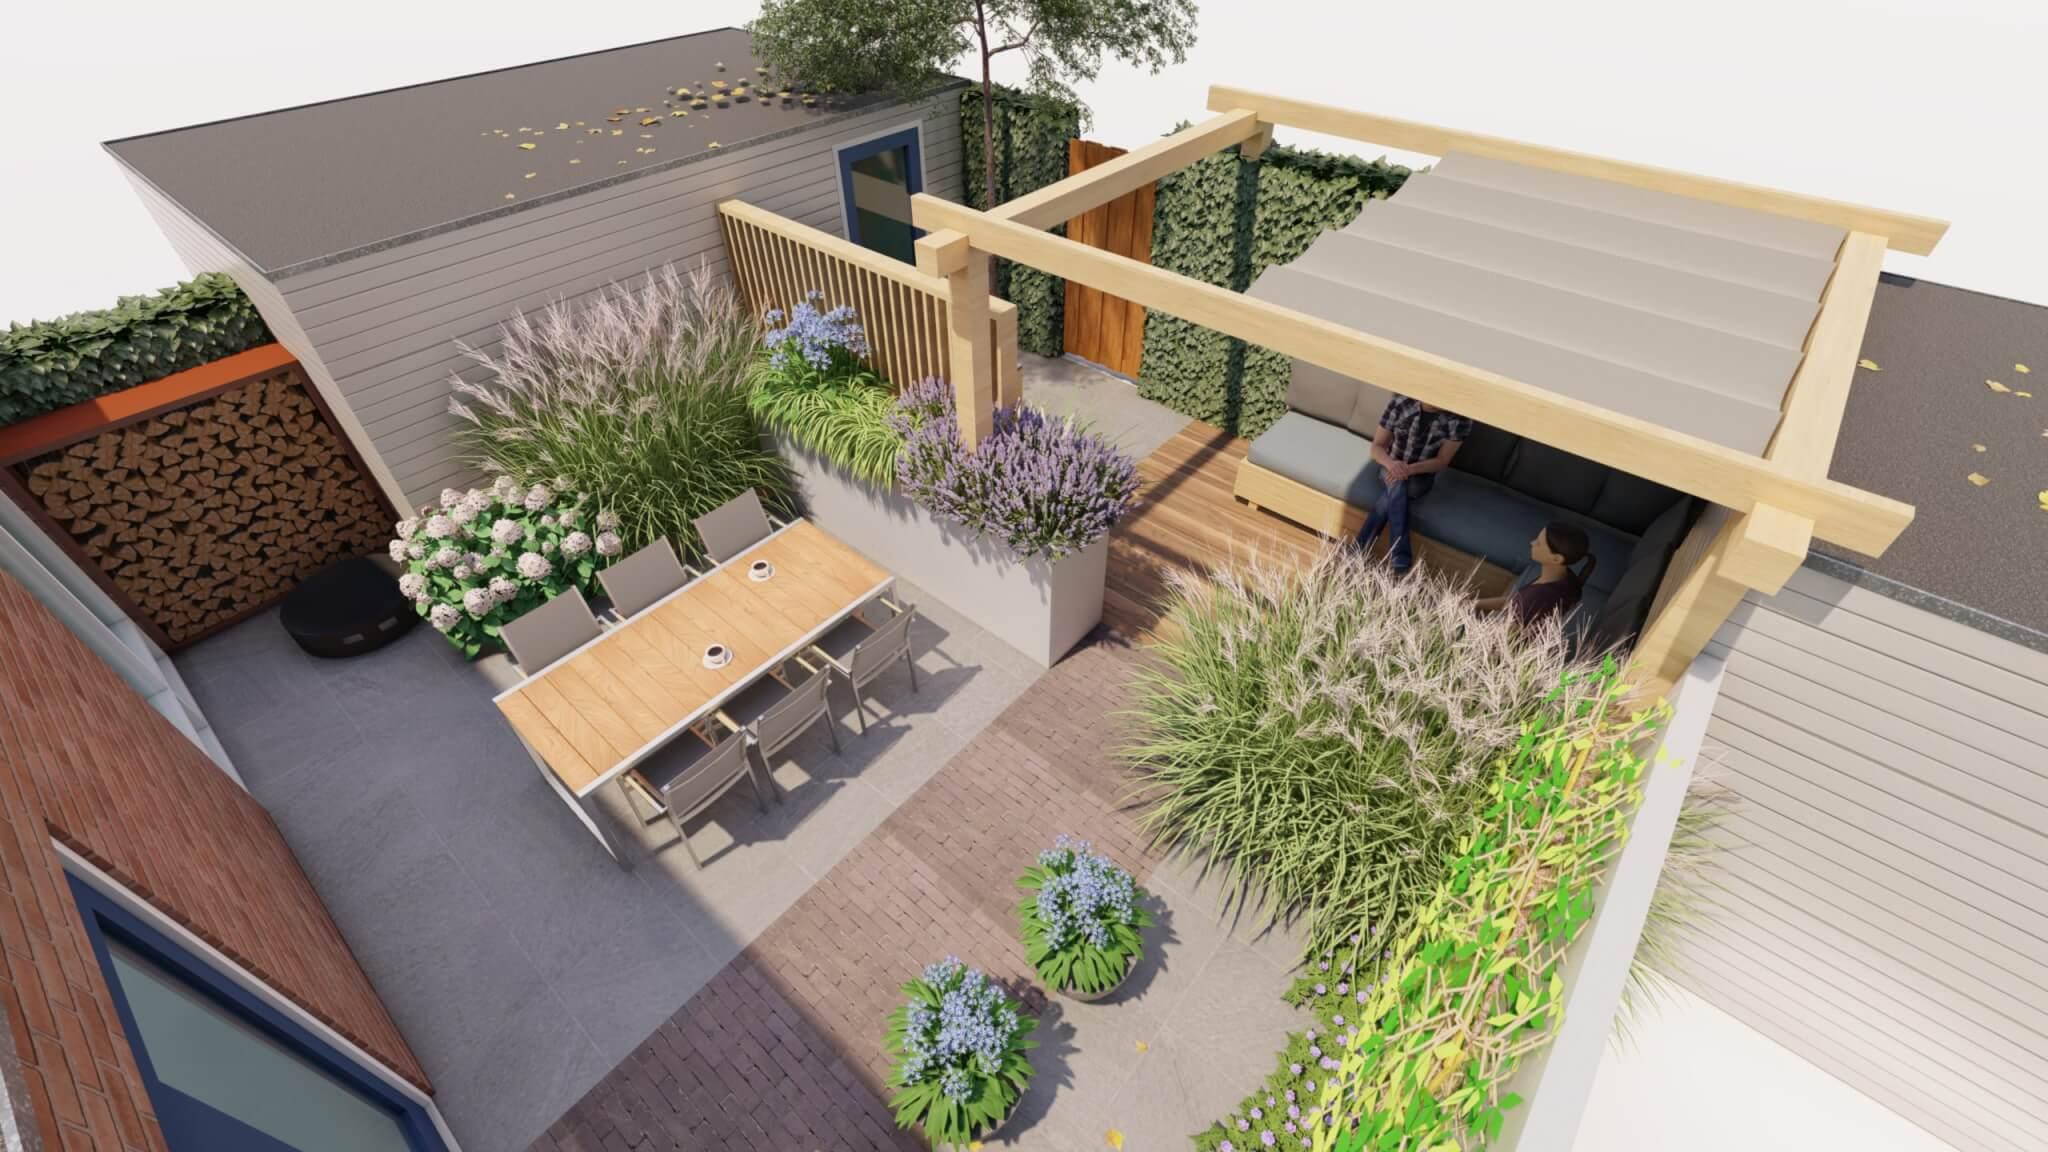 Tuinontwerp 3D modern met veranda